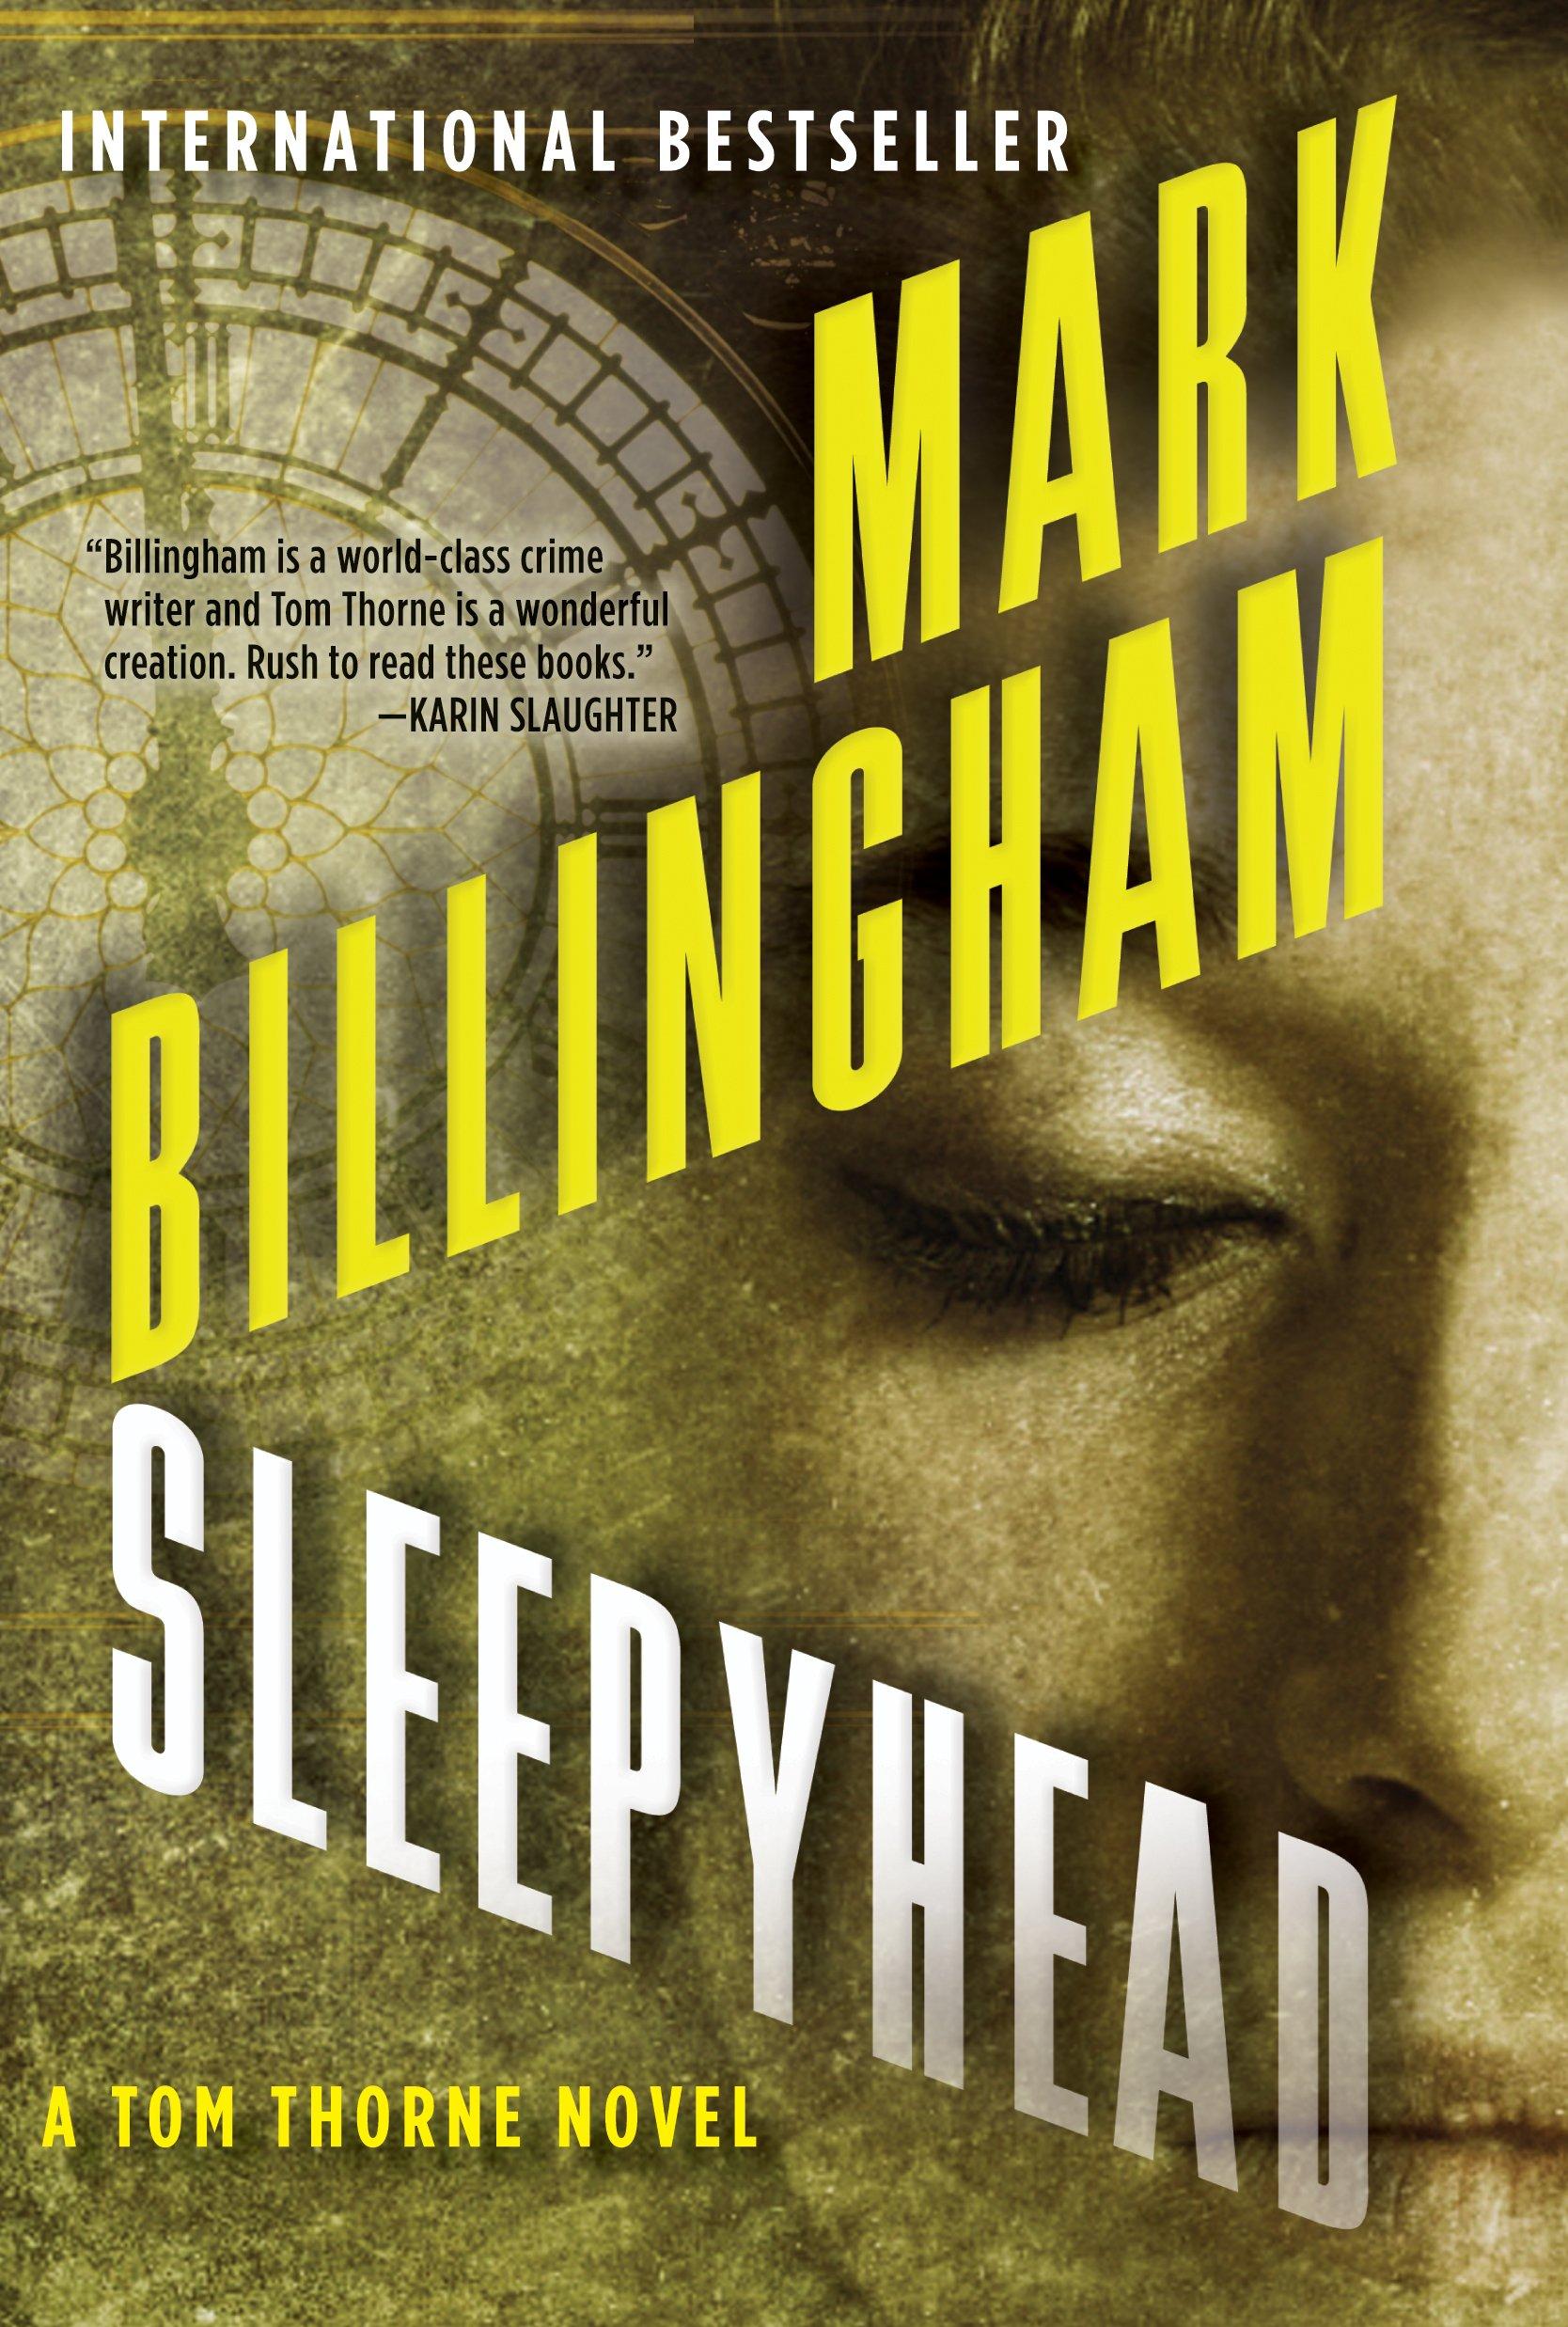 Download Sleepyhead Tom Thorne 1 By Mark Billingham